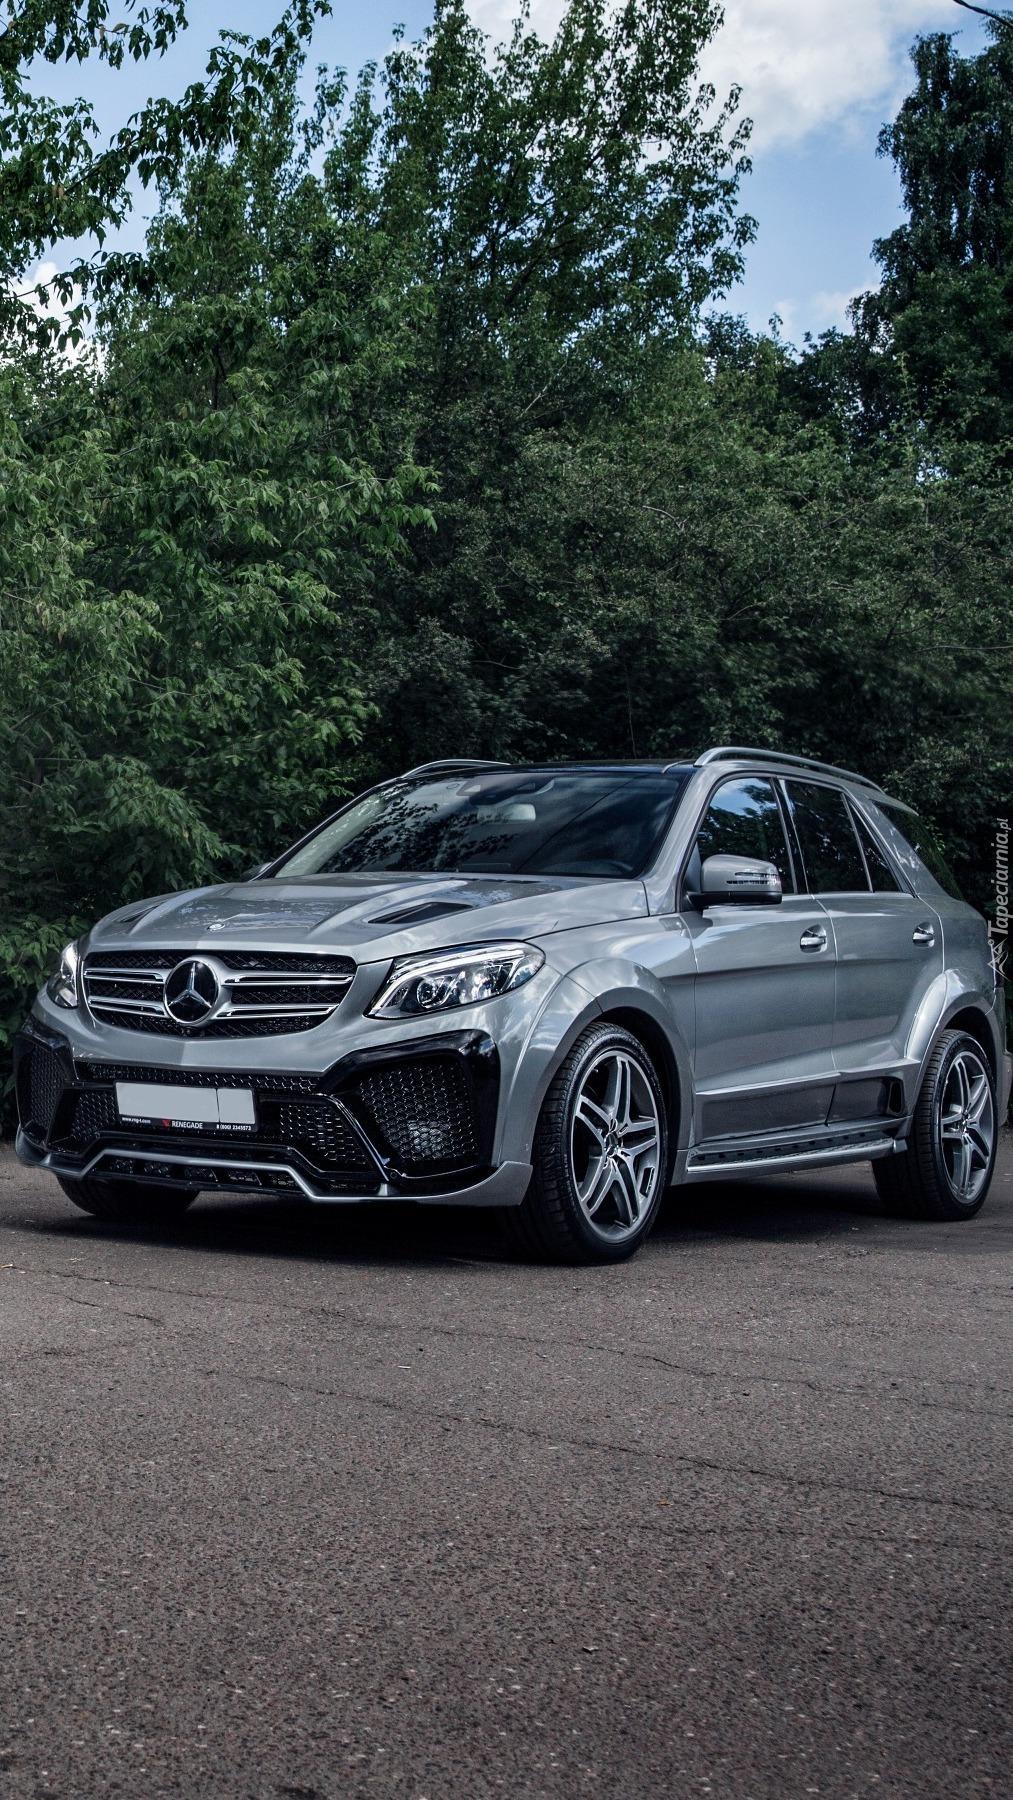 Mercedes-Benz GLE SUV W166